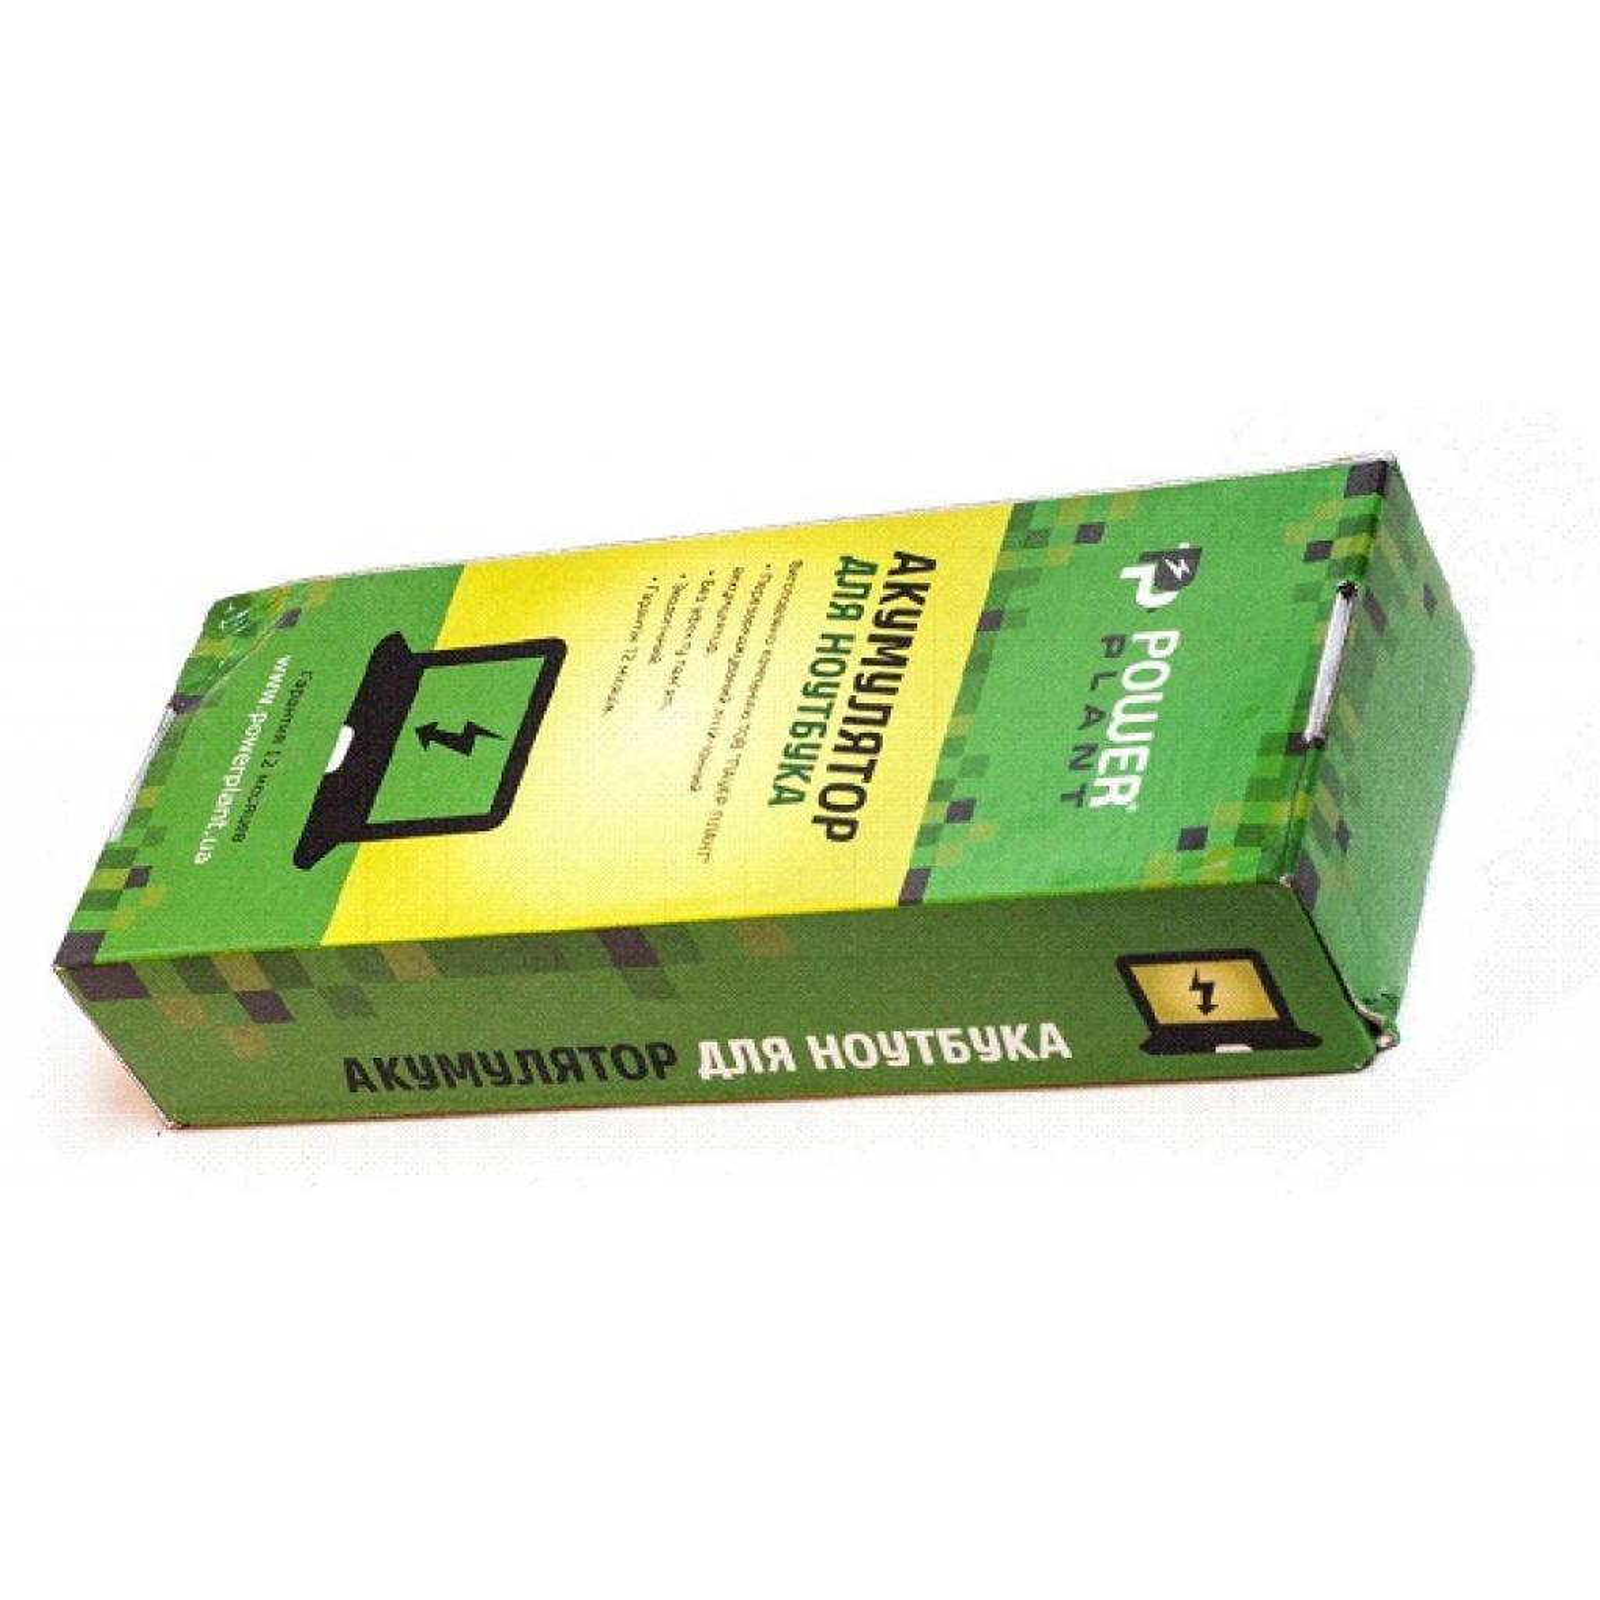 Аккумулятор для ноутбука HP DV9000 (HSTNN-LB33, H90001LH) 14.4V 5200mAh PowerPlant (NB00000128) изображение 3